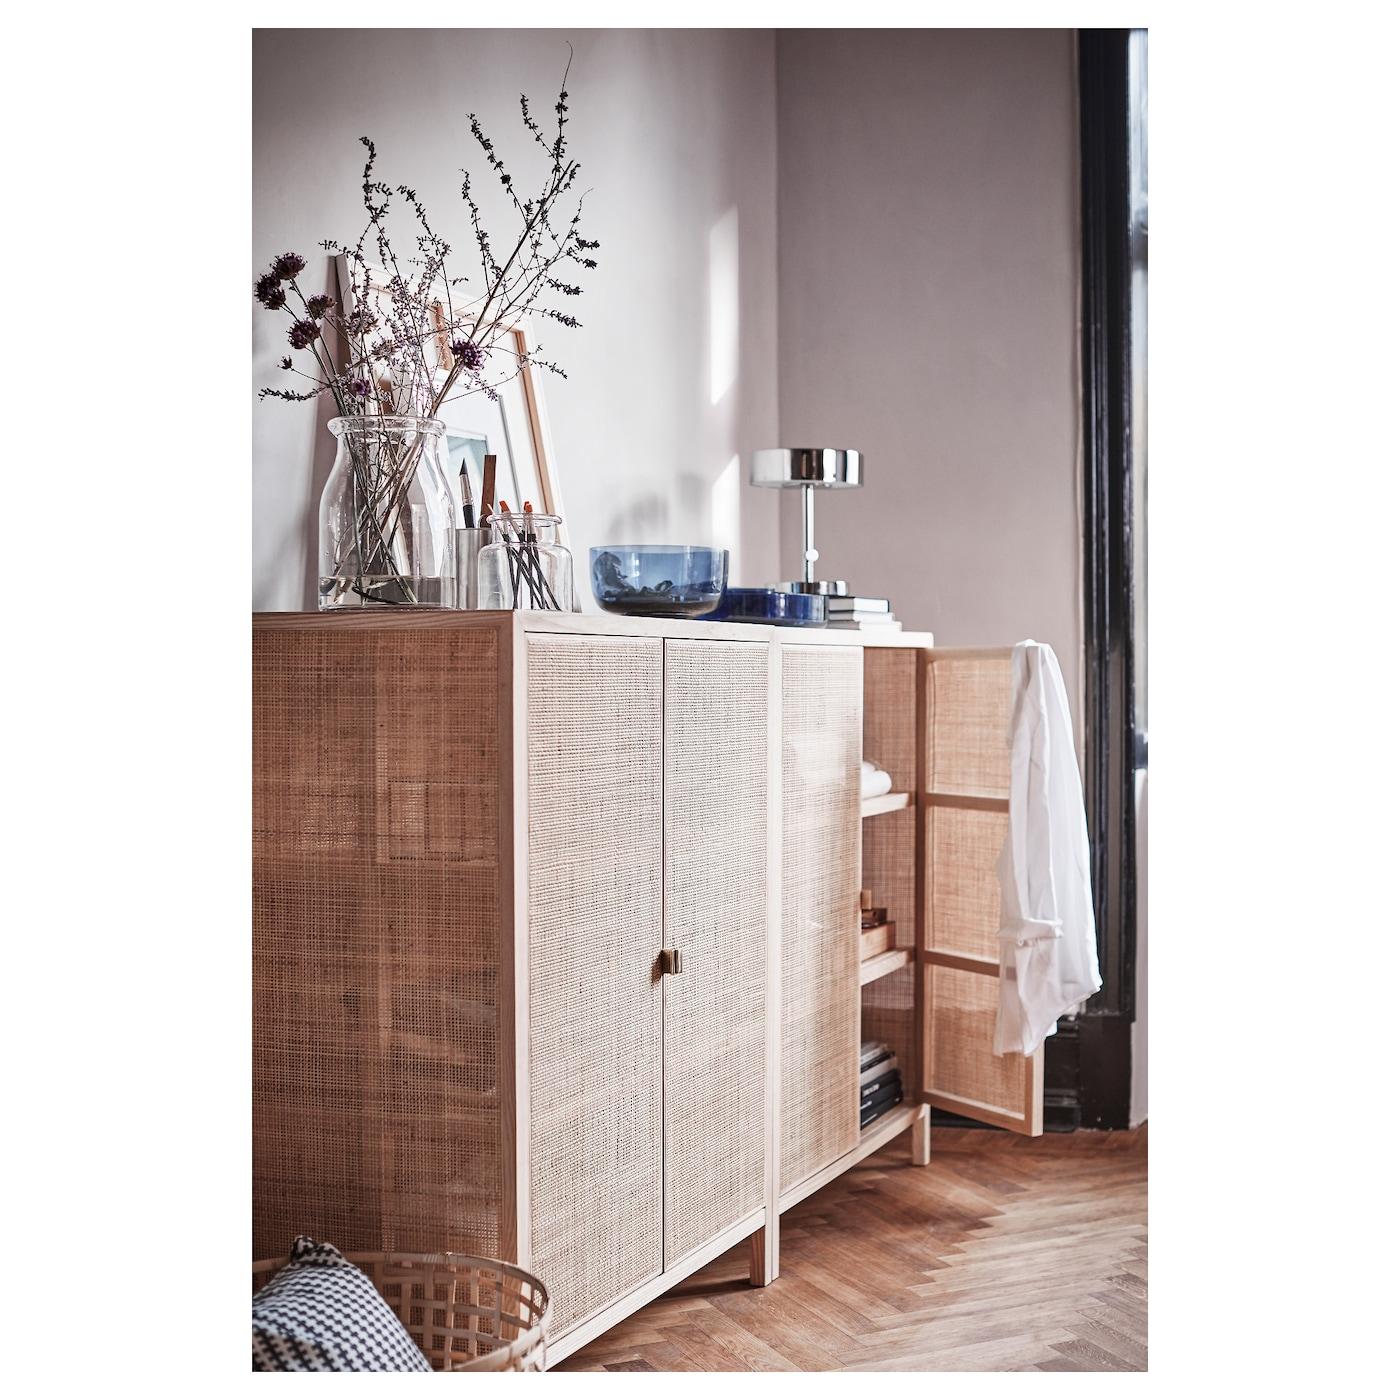 Ikea Mobili In Vimini stockholm 2017 cabinet - rattan, ash